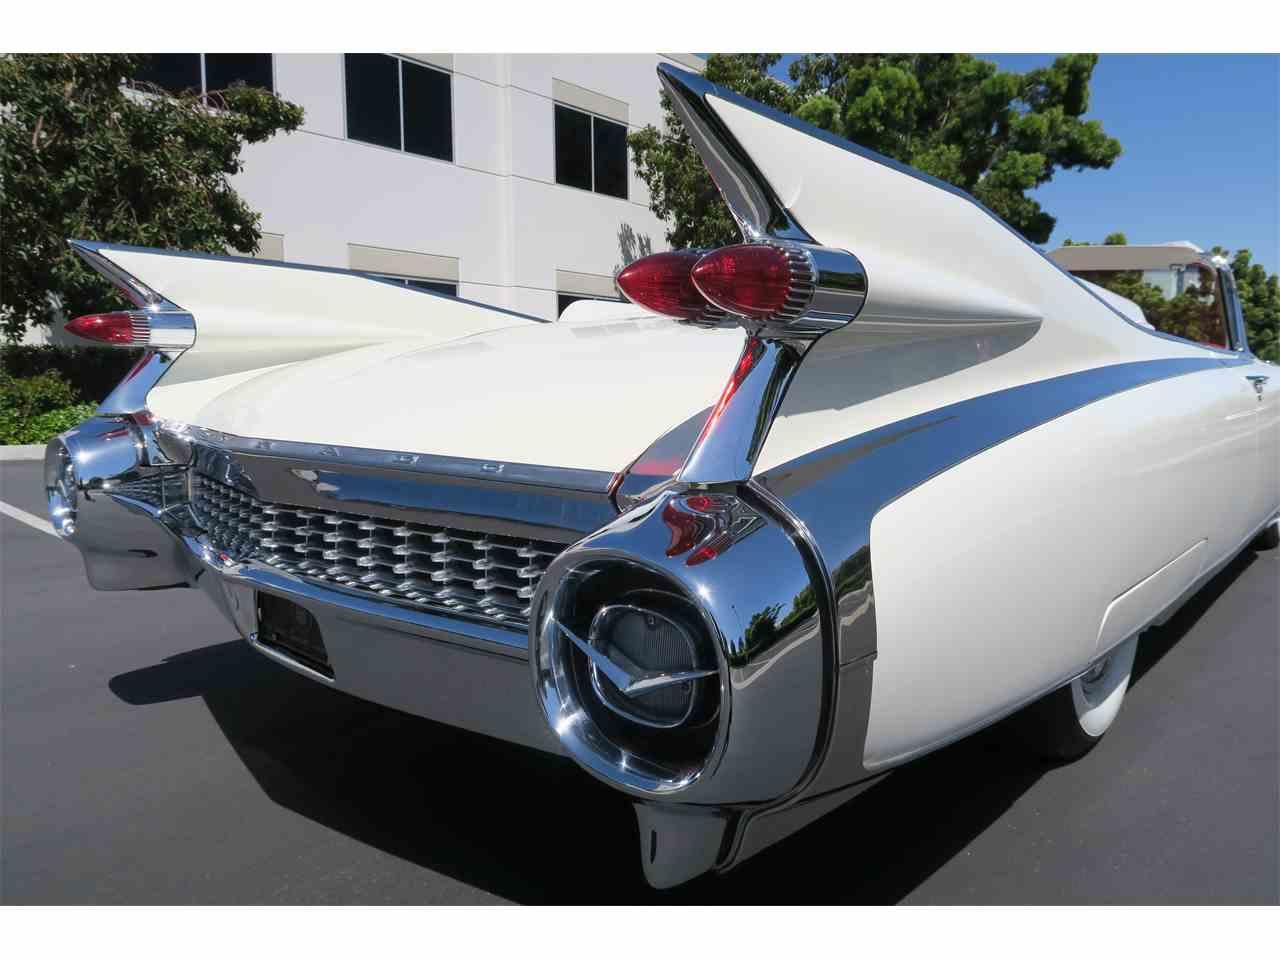 Cadillac Eldorado Classic Cars For Sale San Diego